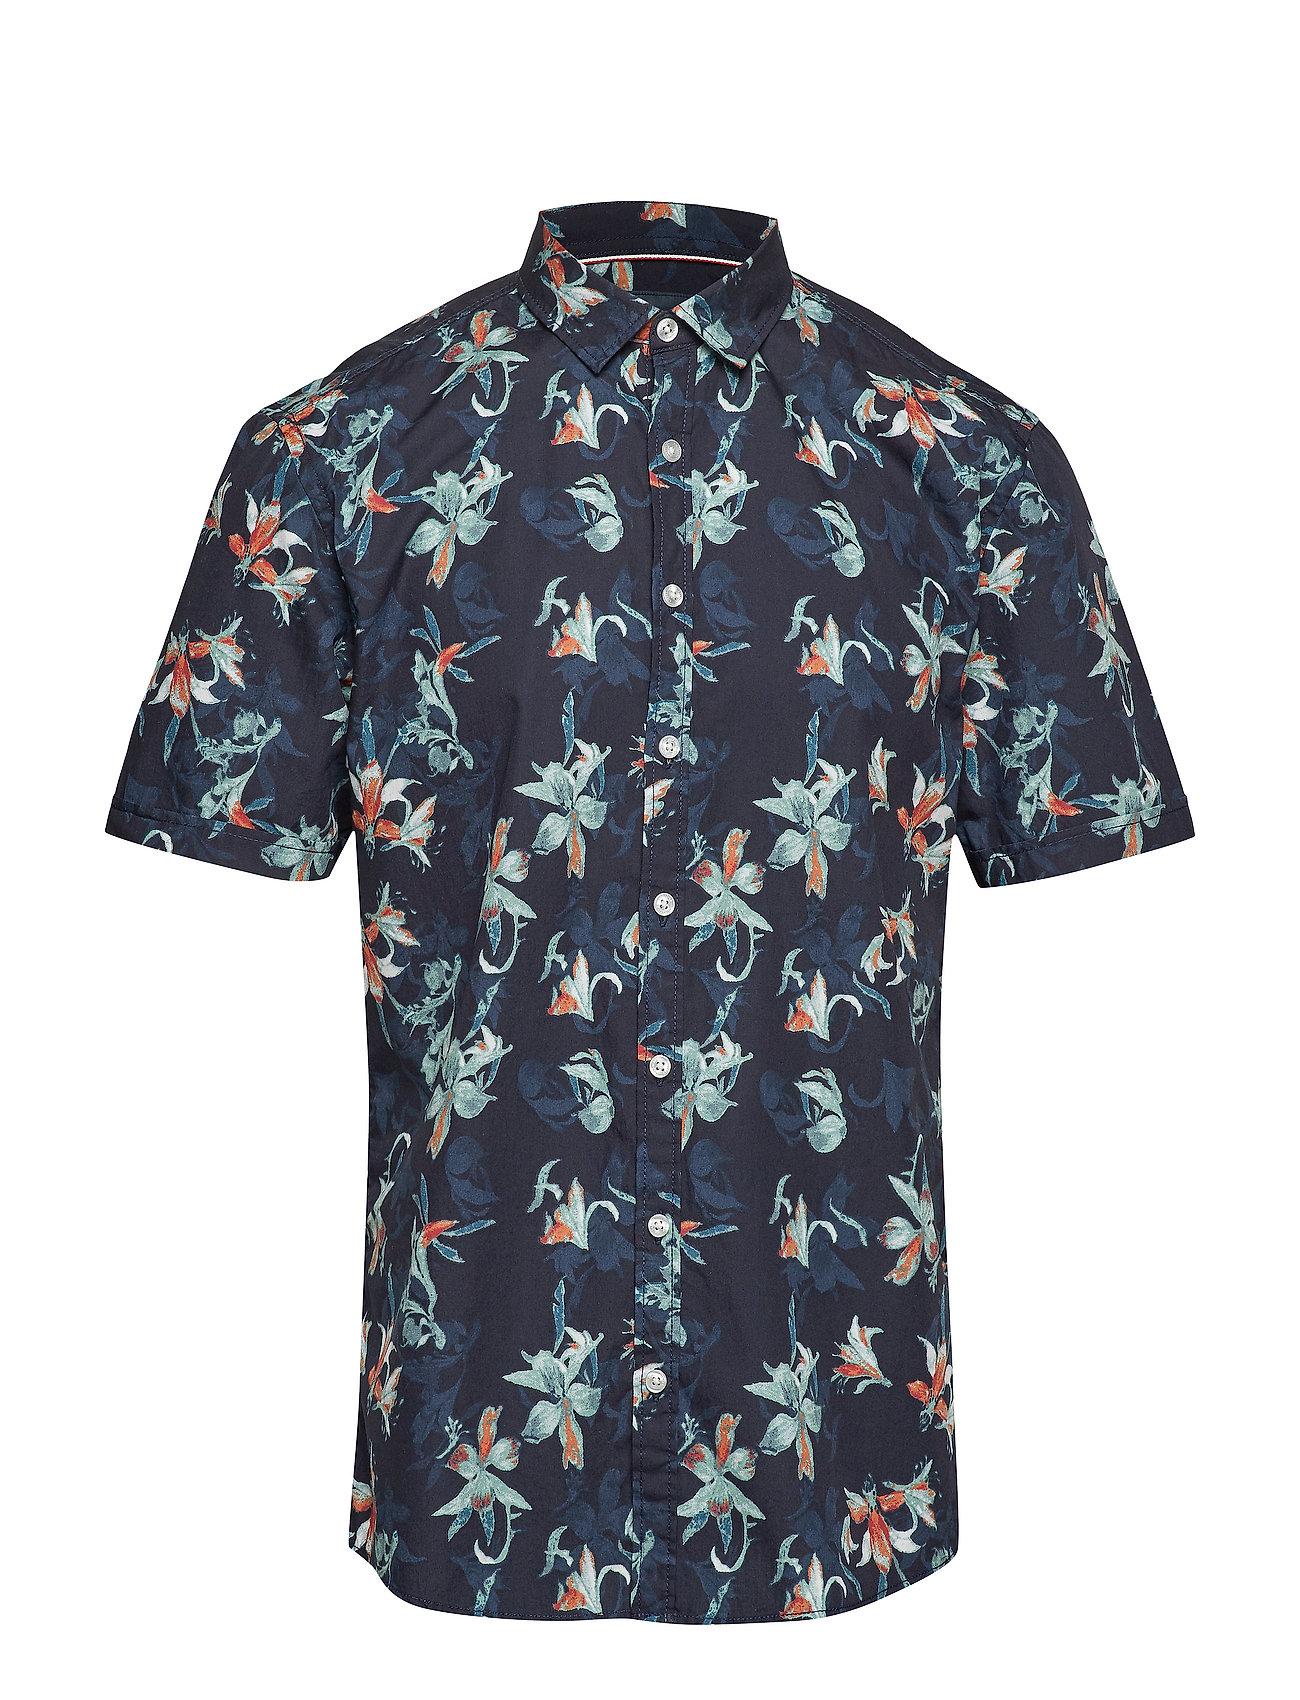 Lindbergh Holiday printed shirt S/S - DARK BLUE